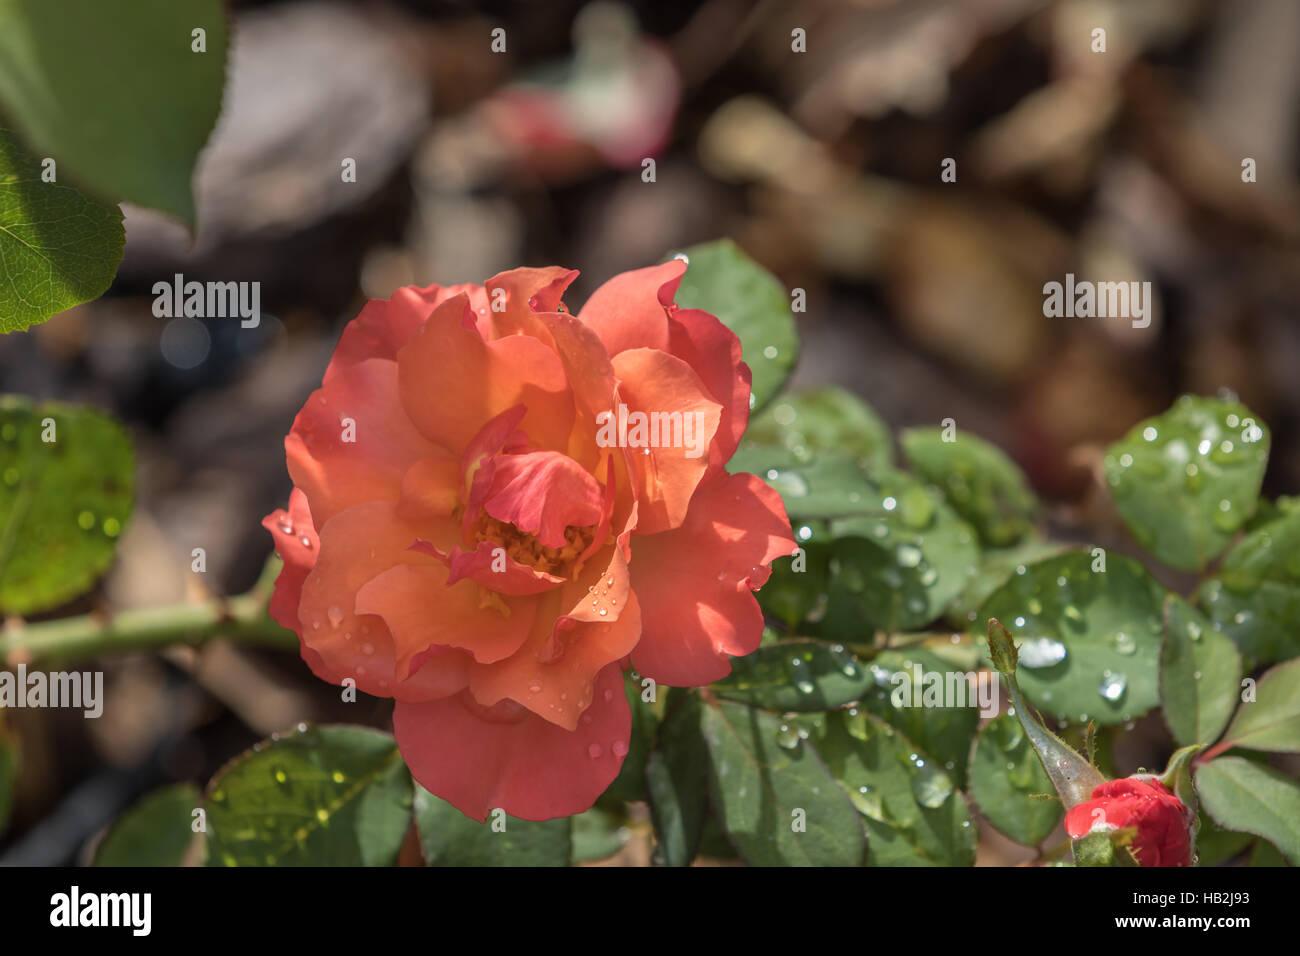 Eine Orange Rose, Winter Park, Orlando, Florida Stockfoto